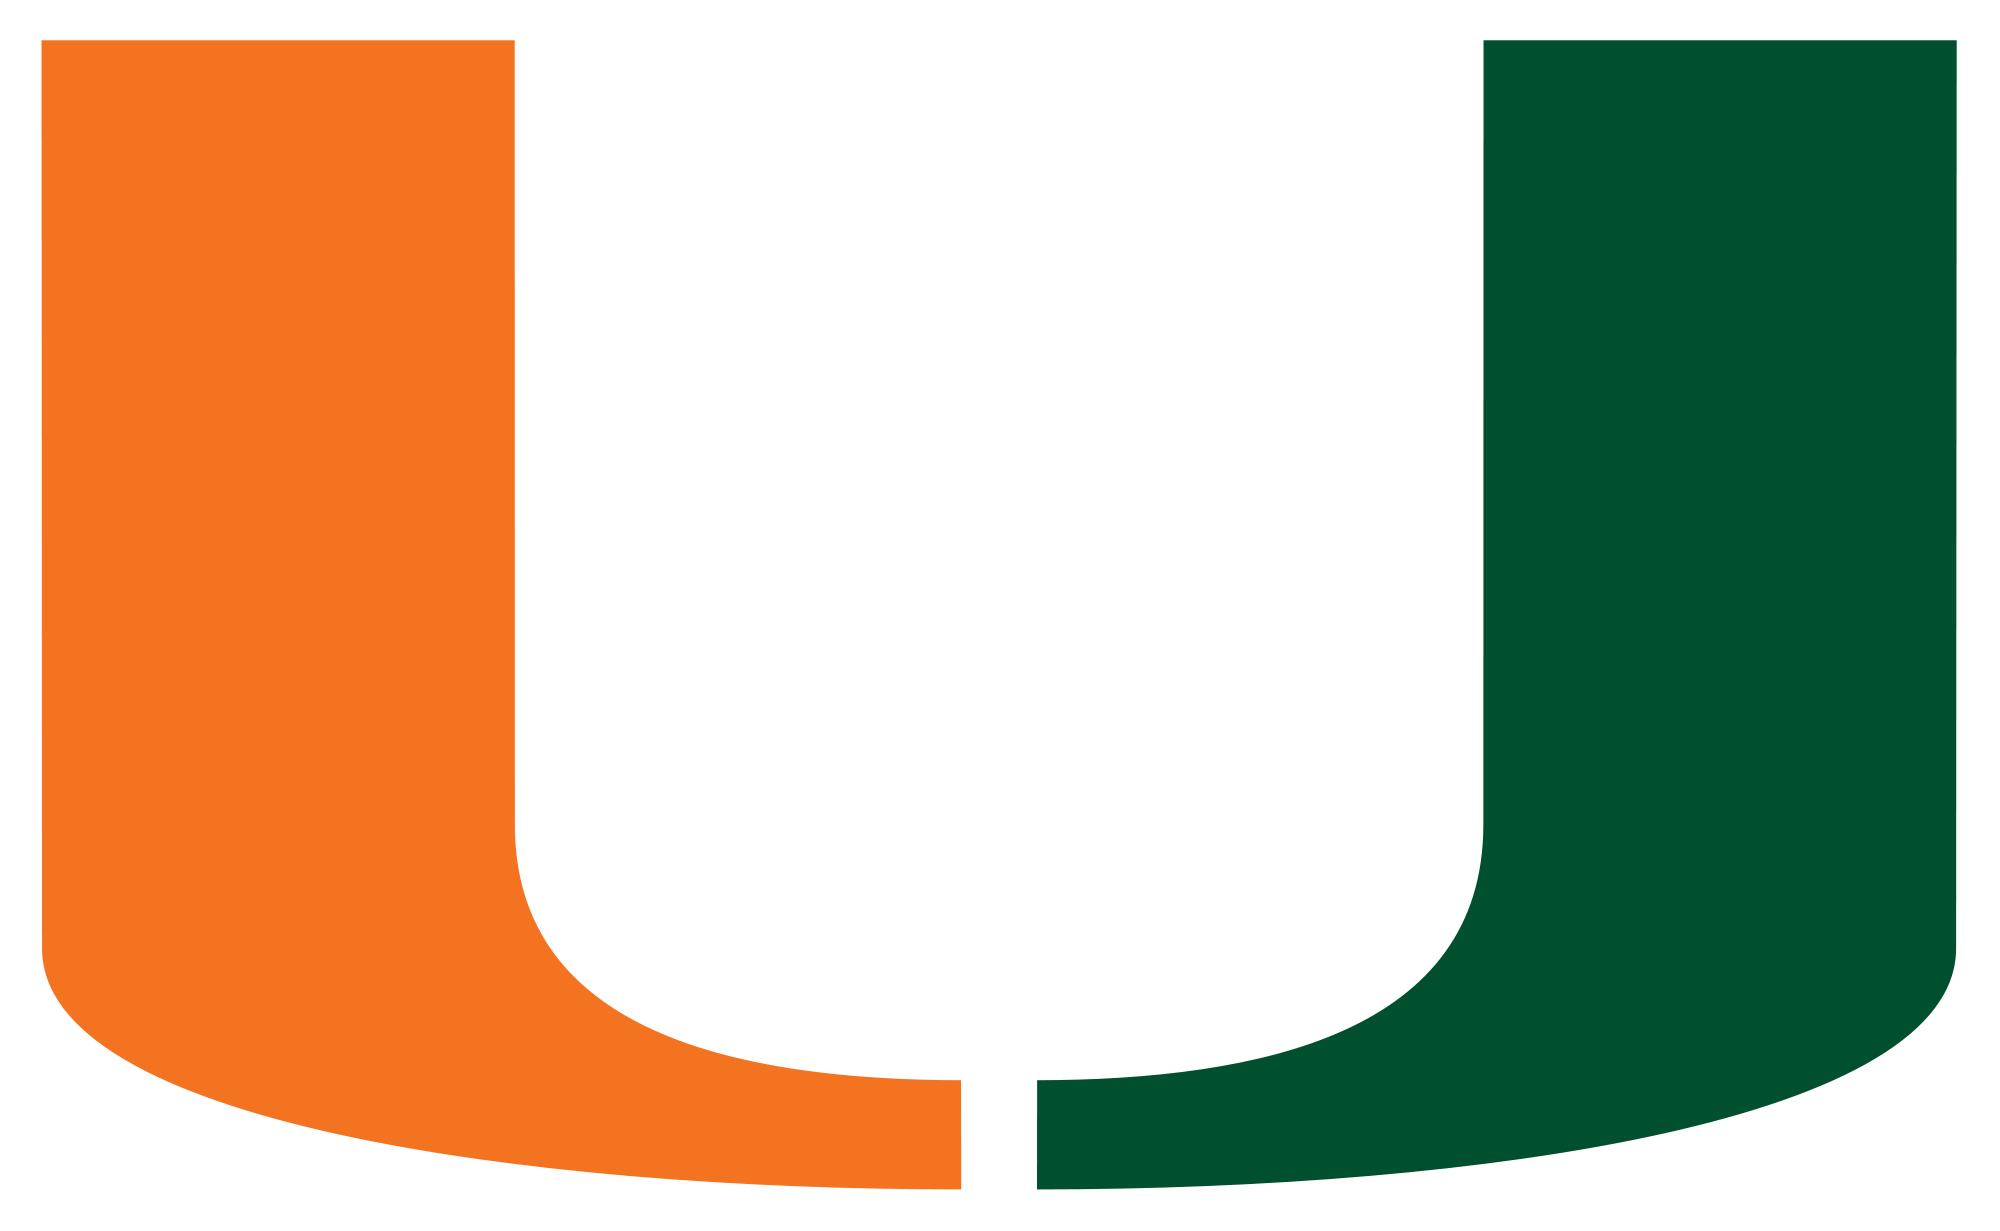 University of Miami | Overview | Plexuss com